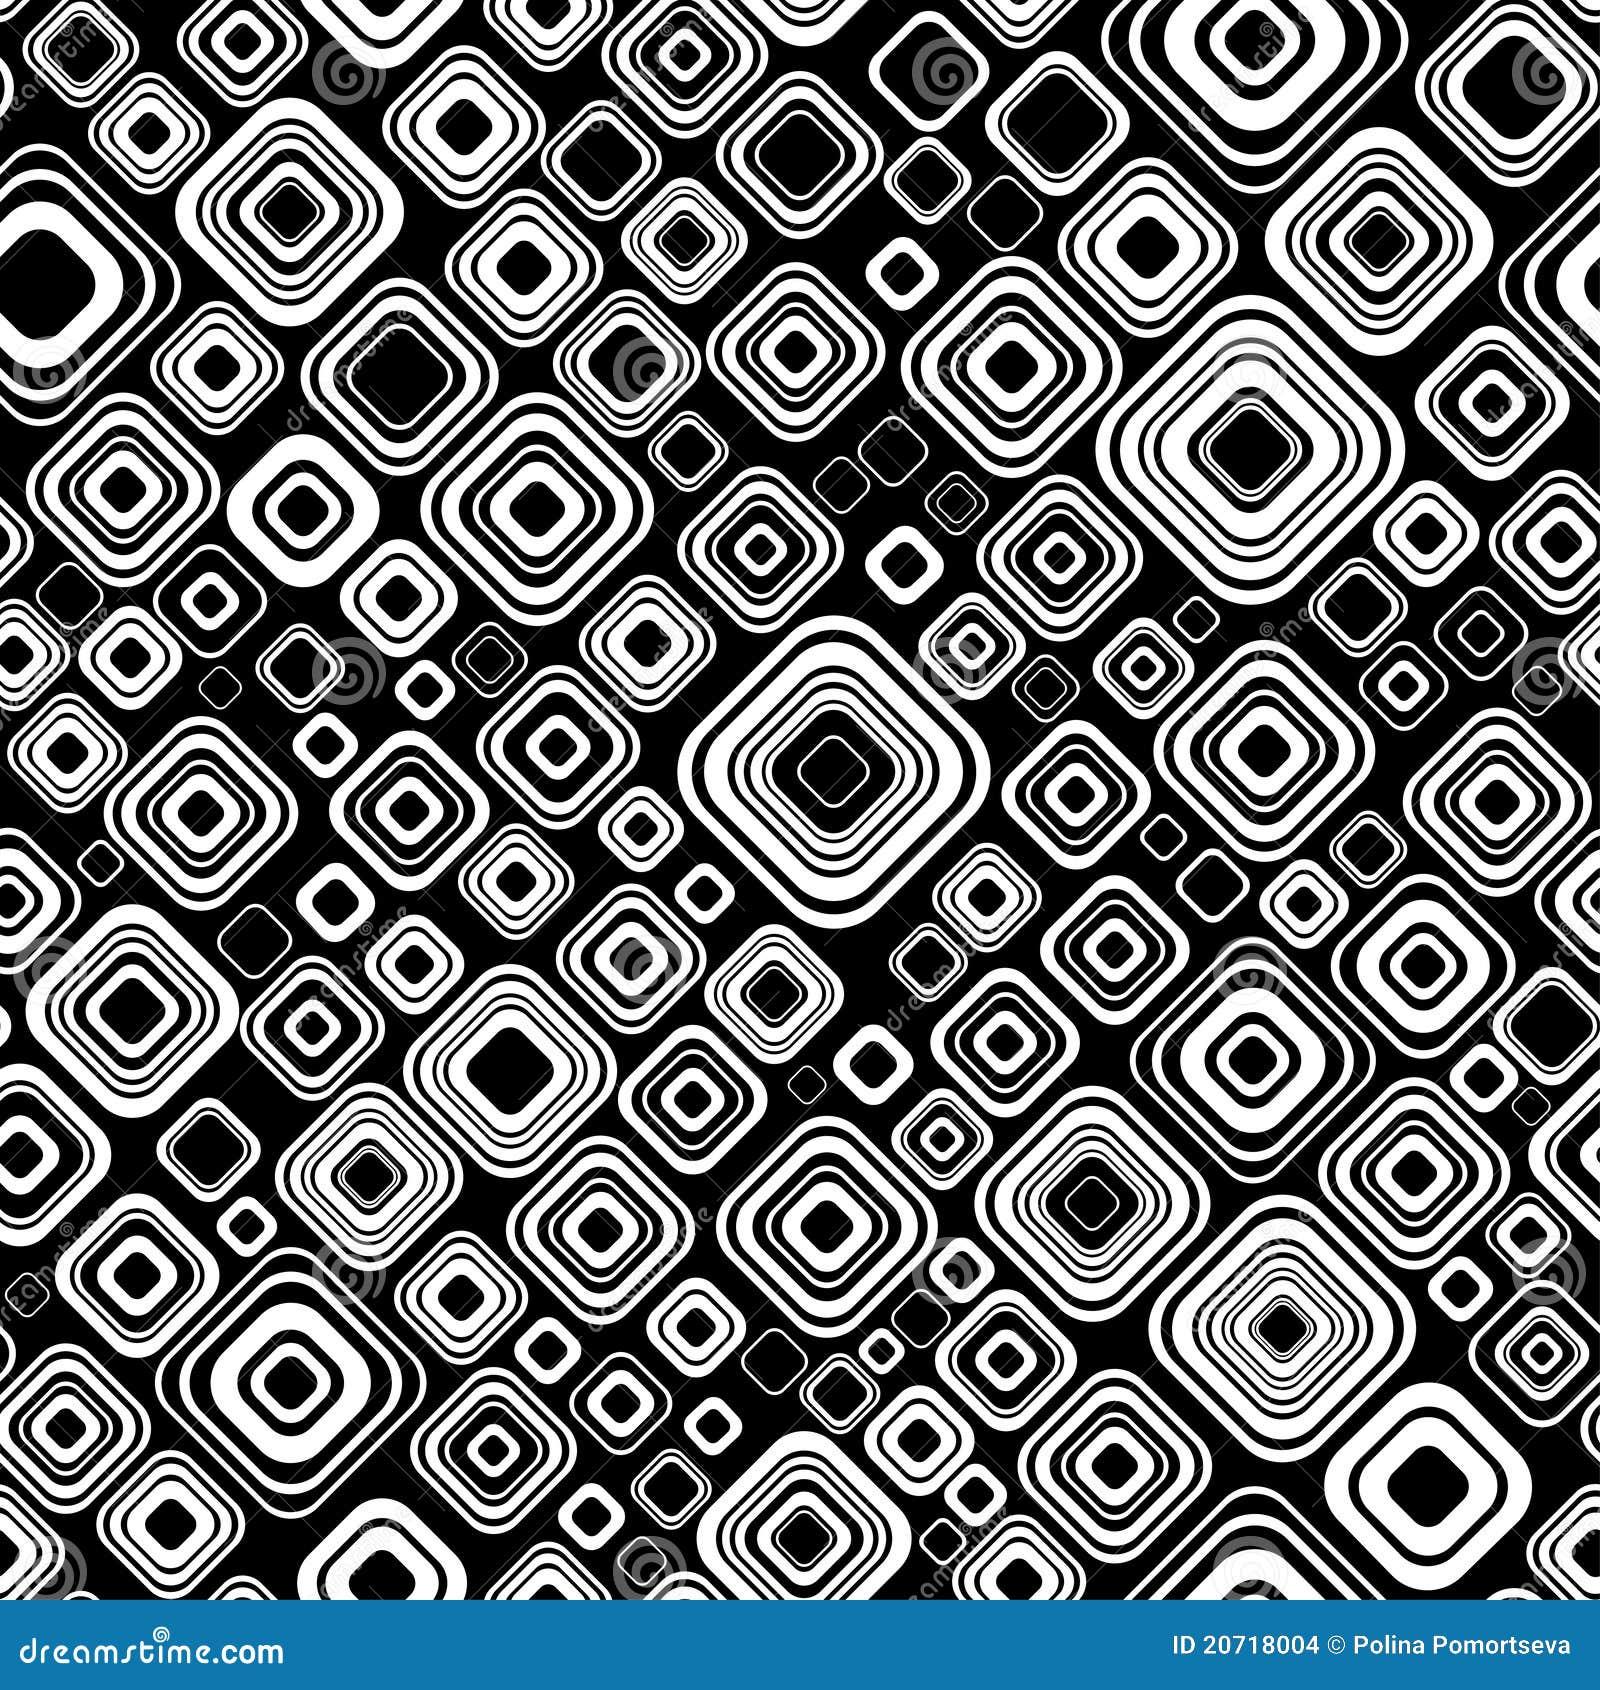 nahtloses schwarzweiss muster stockbilder bild 20718004. Black Bedroom Furniture Sets. Home Design Ideas